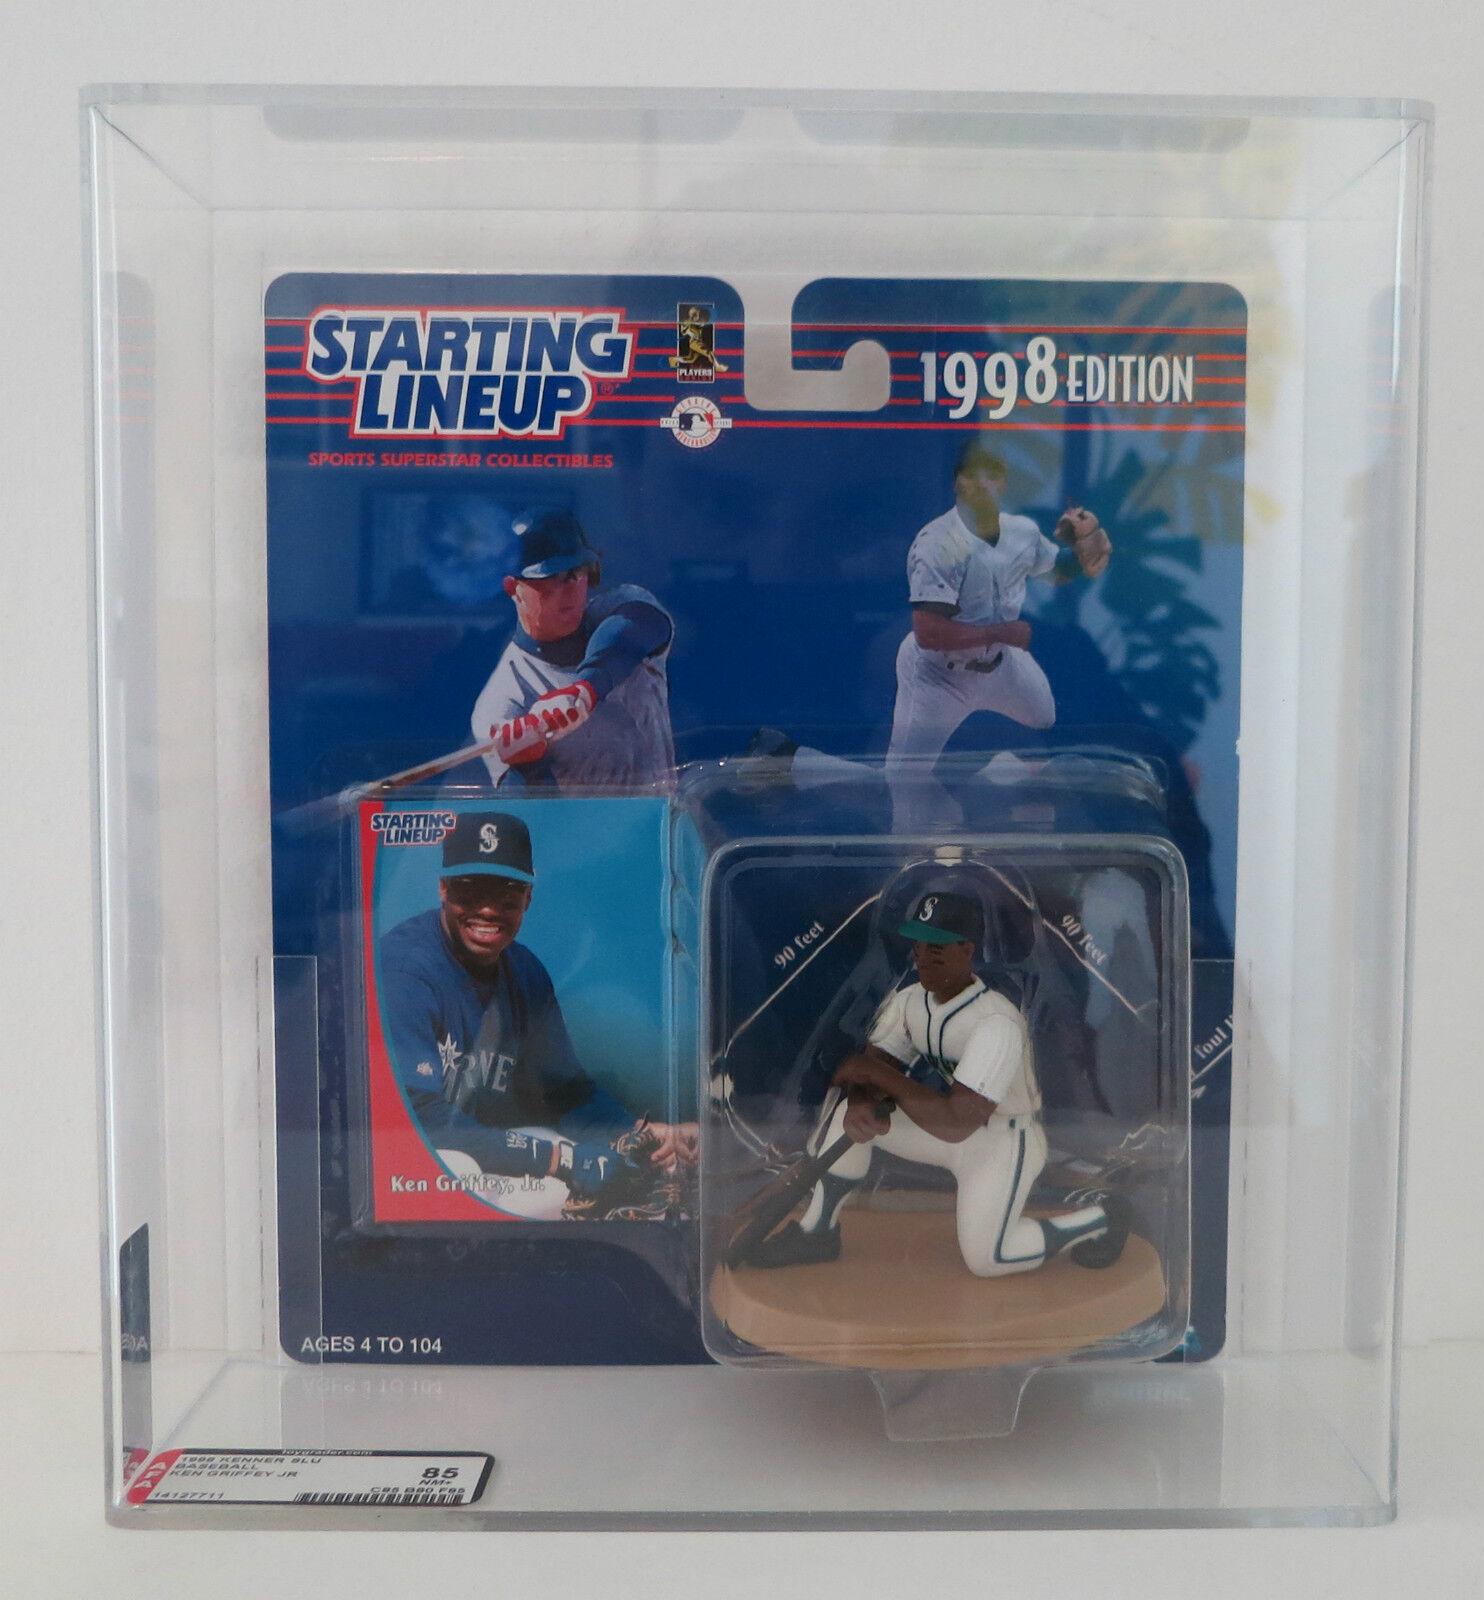 Ken Griffey Jr Starting Lineup Mlb Baseball Figura De Acción Afa Graduado 1998 Kenner